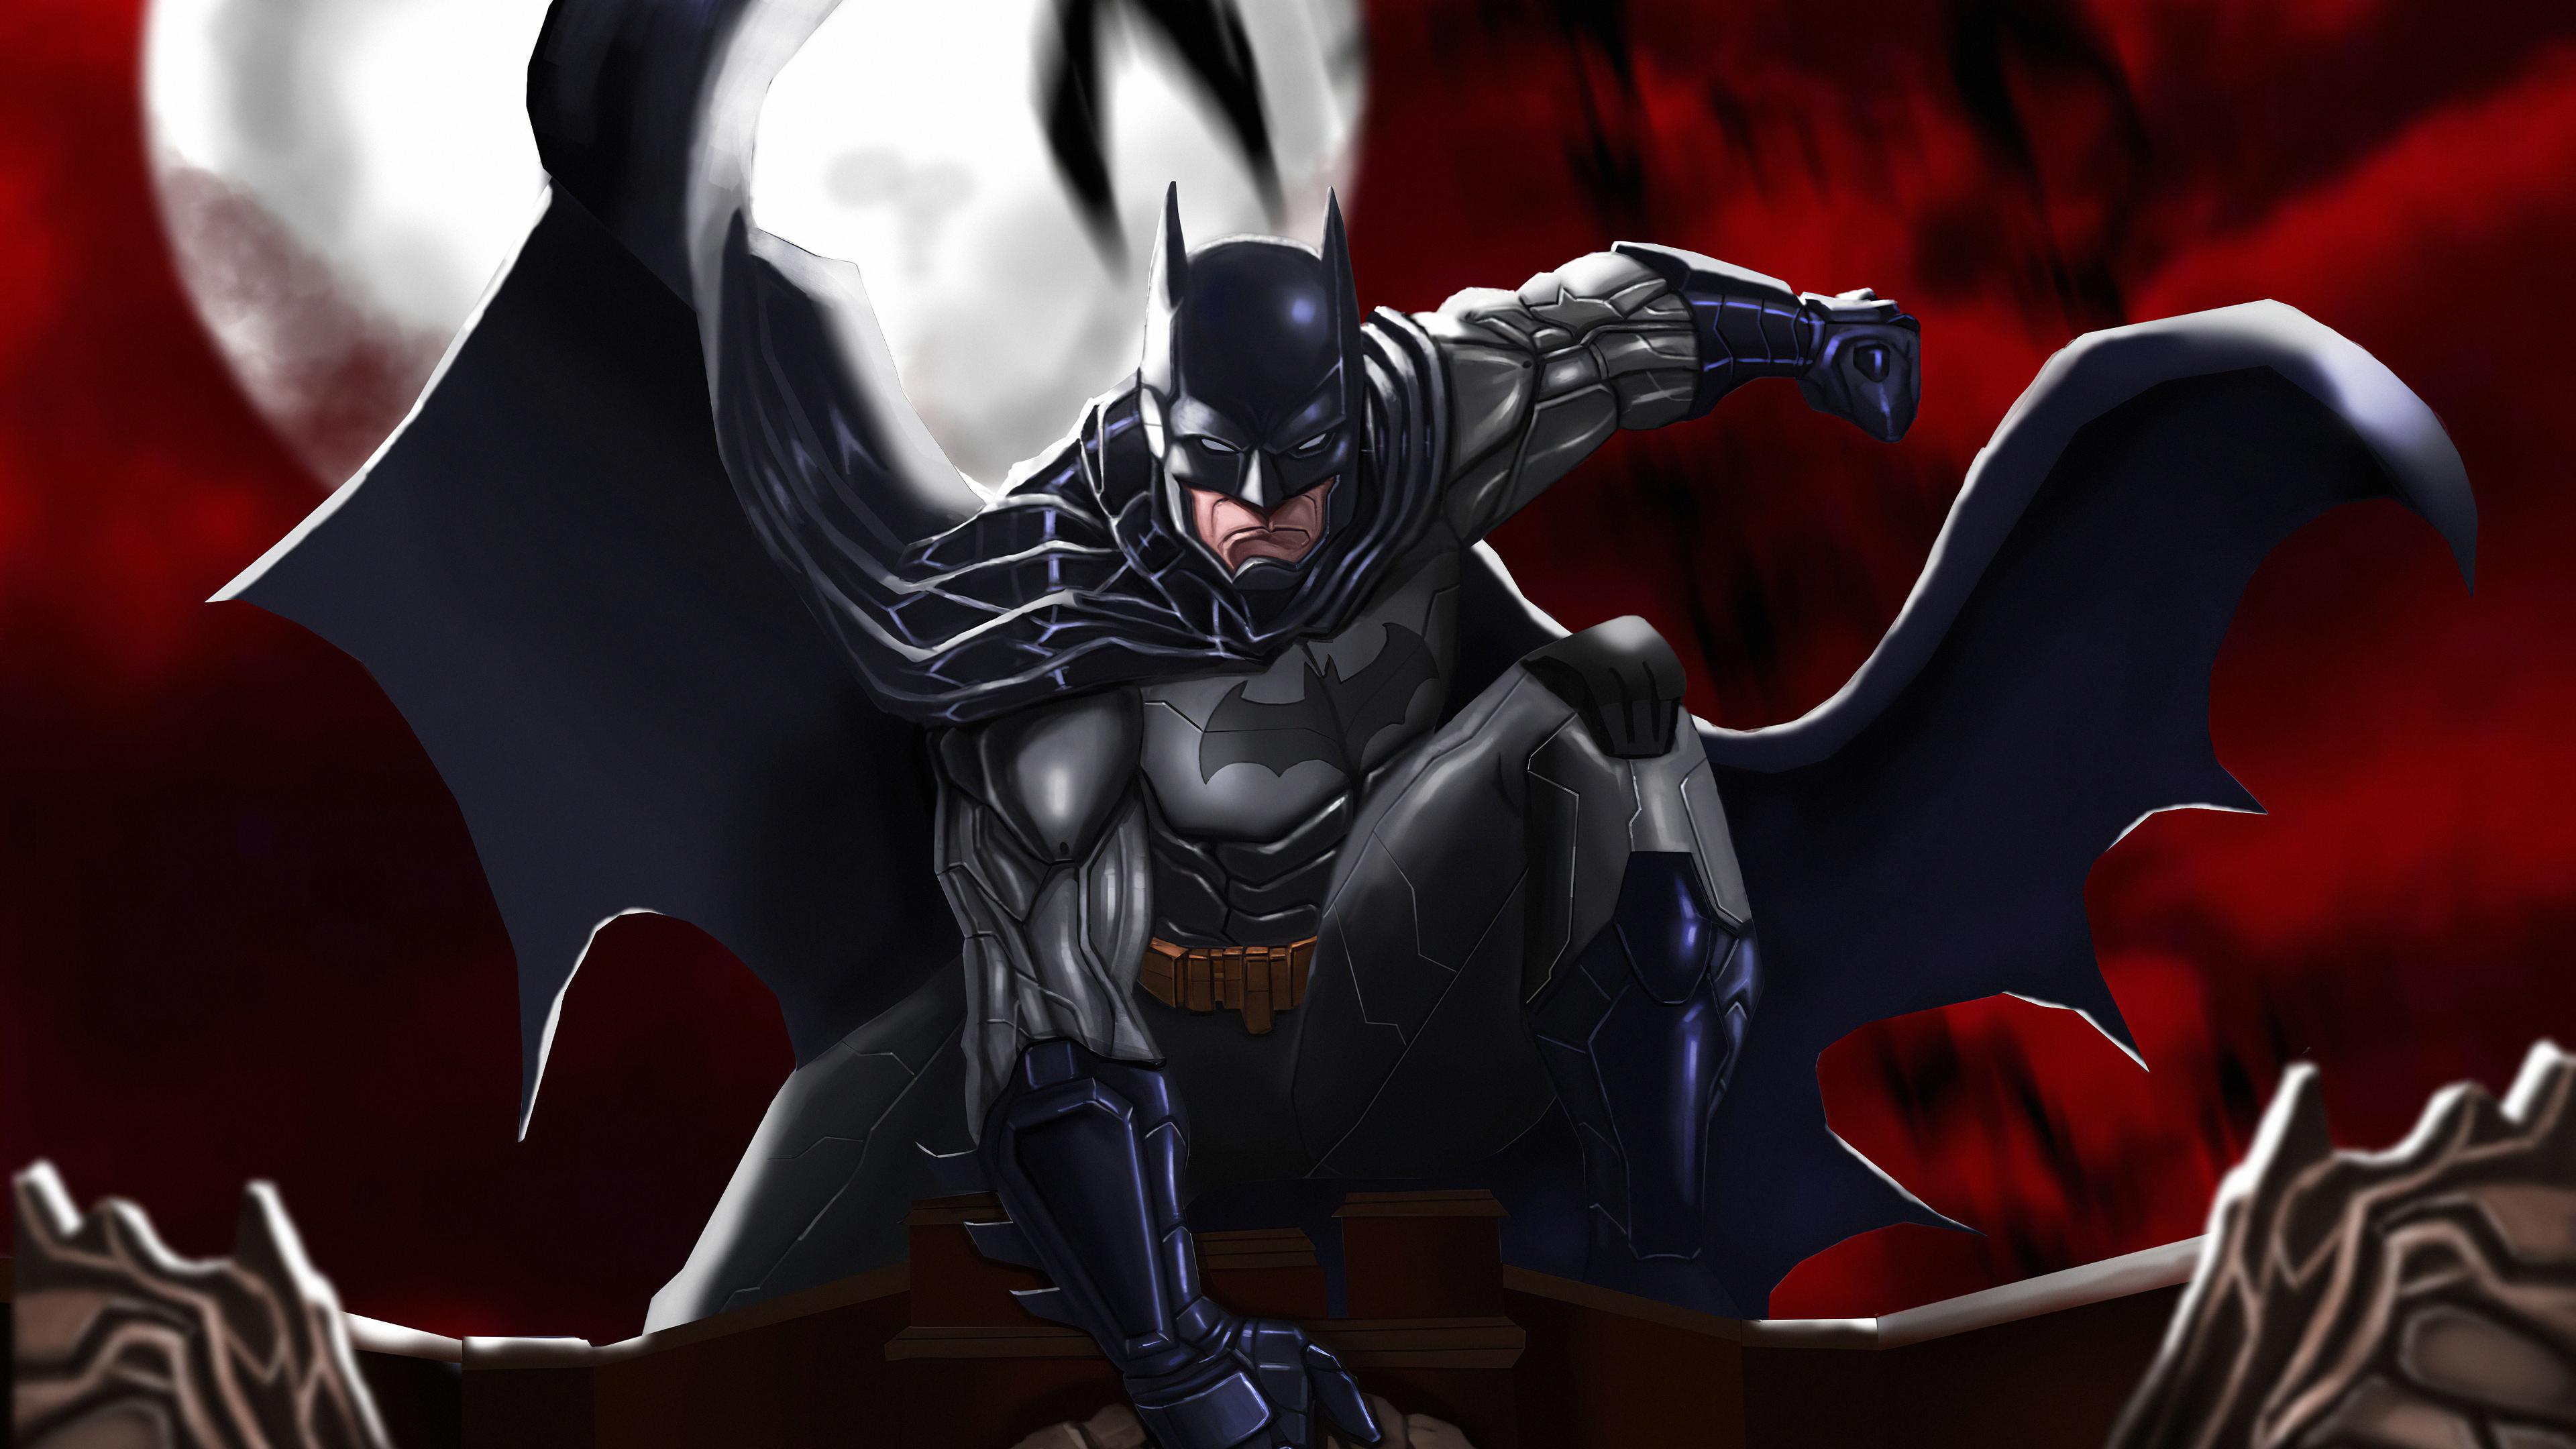 batman art 1576091875 - Batman Art - batman wallpaper phone 4k, batman wallpaper 4k, batman art wallpaper 4k, Batman 4k wallpaper